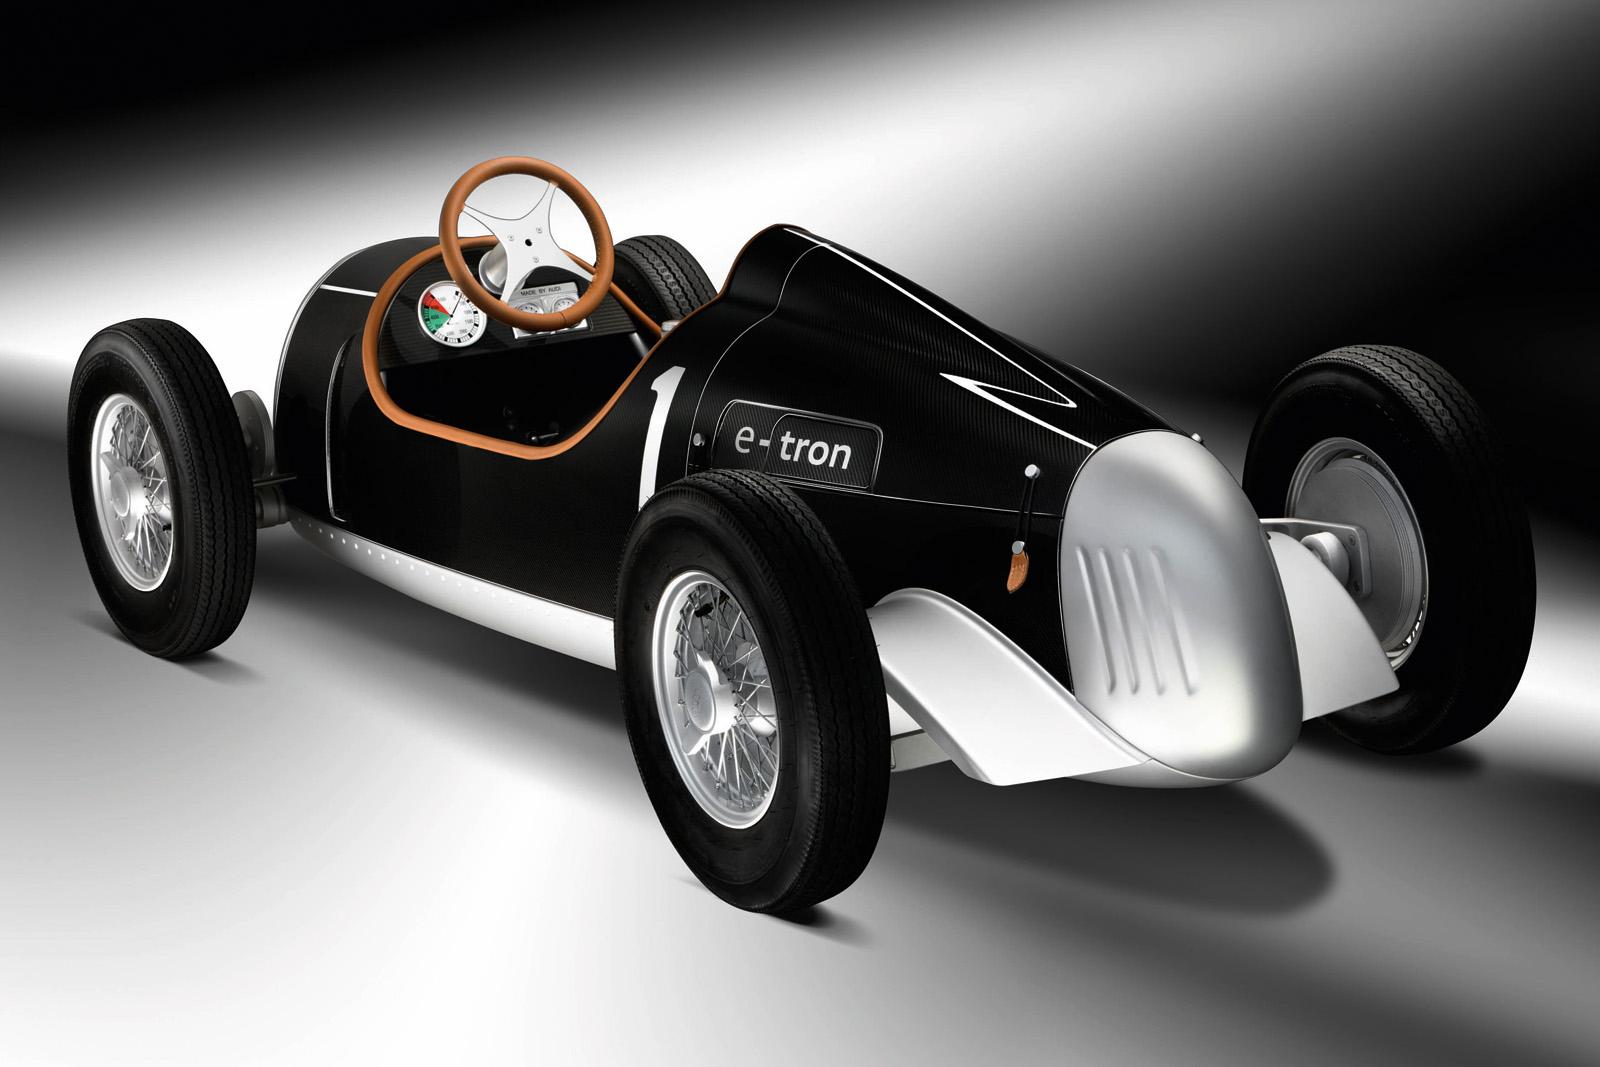 1295608930_audi2be-tron2bscale2bmodel2b2 Масштабная игрушка от Audi – Auto Union Type C e-tron!